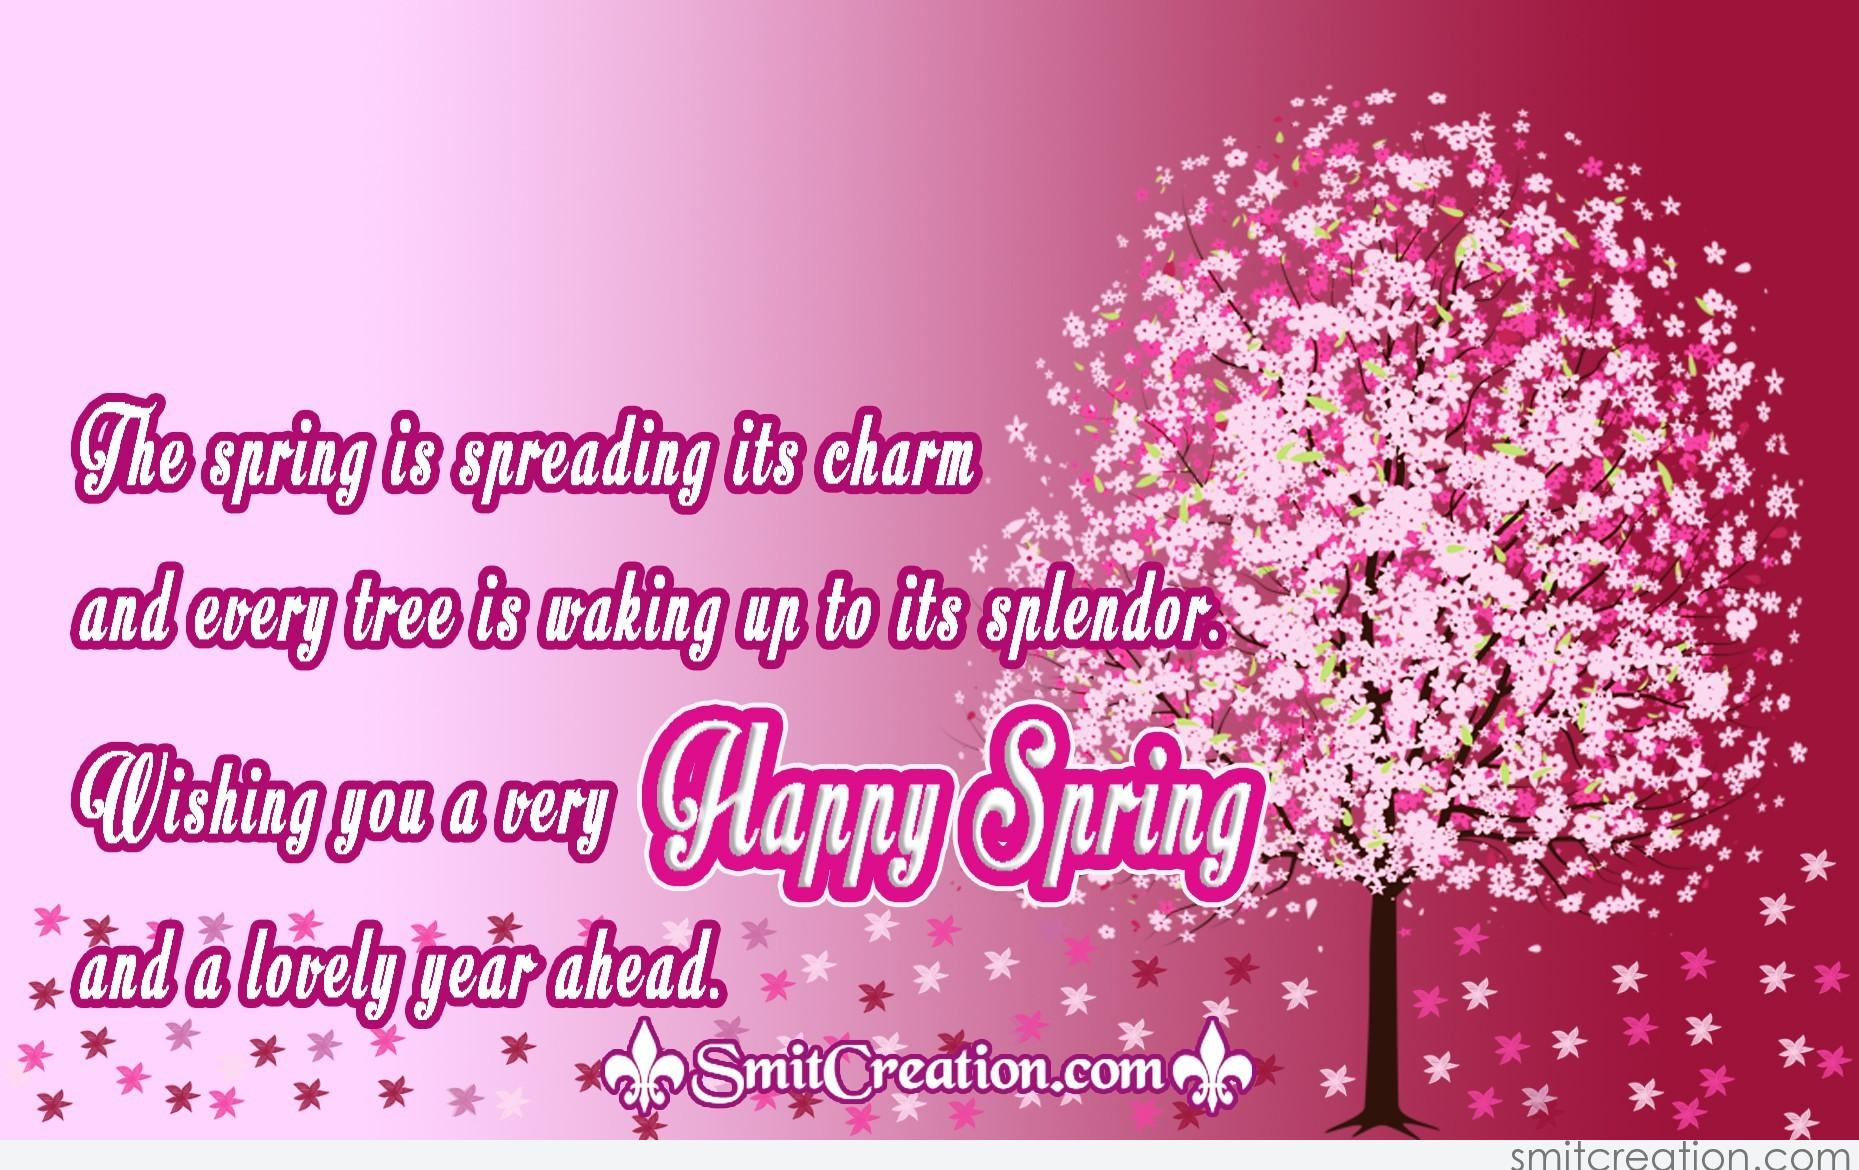 Wishing you a very Happy Spring - SmitCreation.com